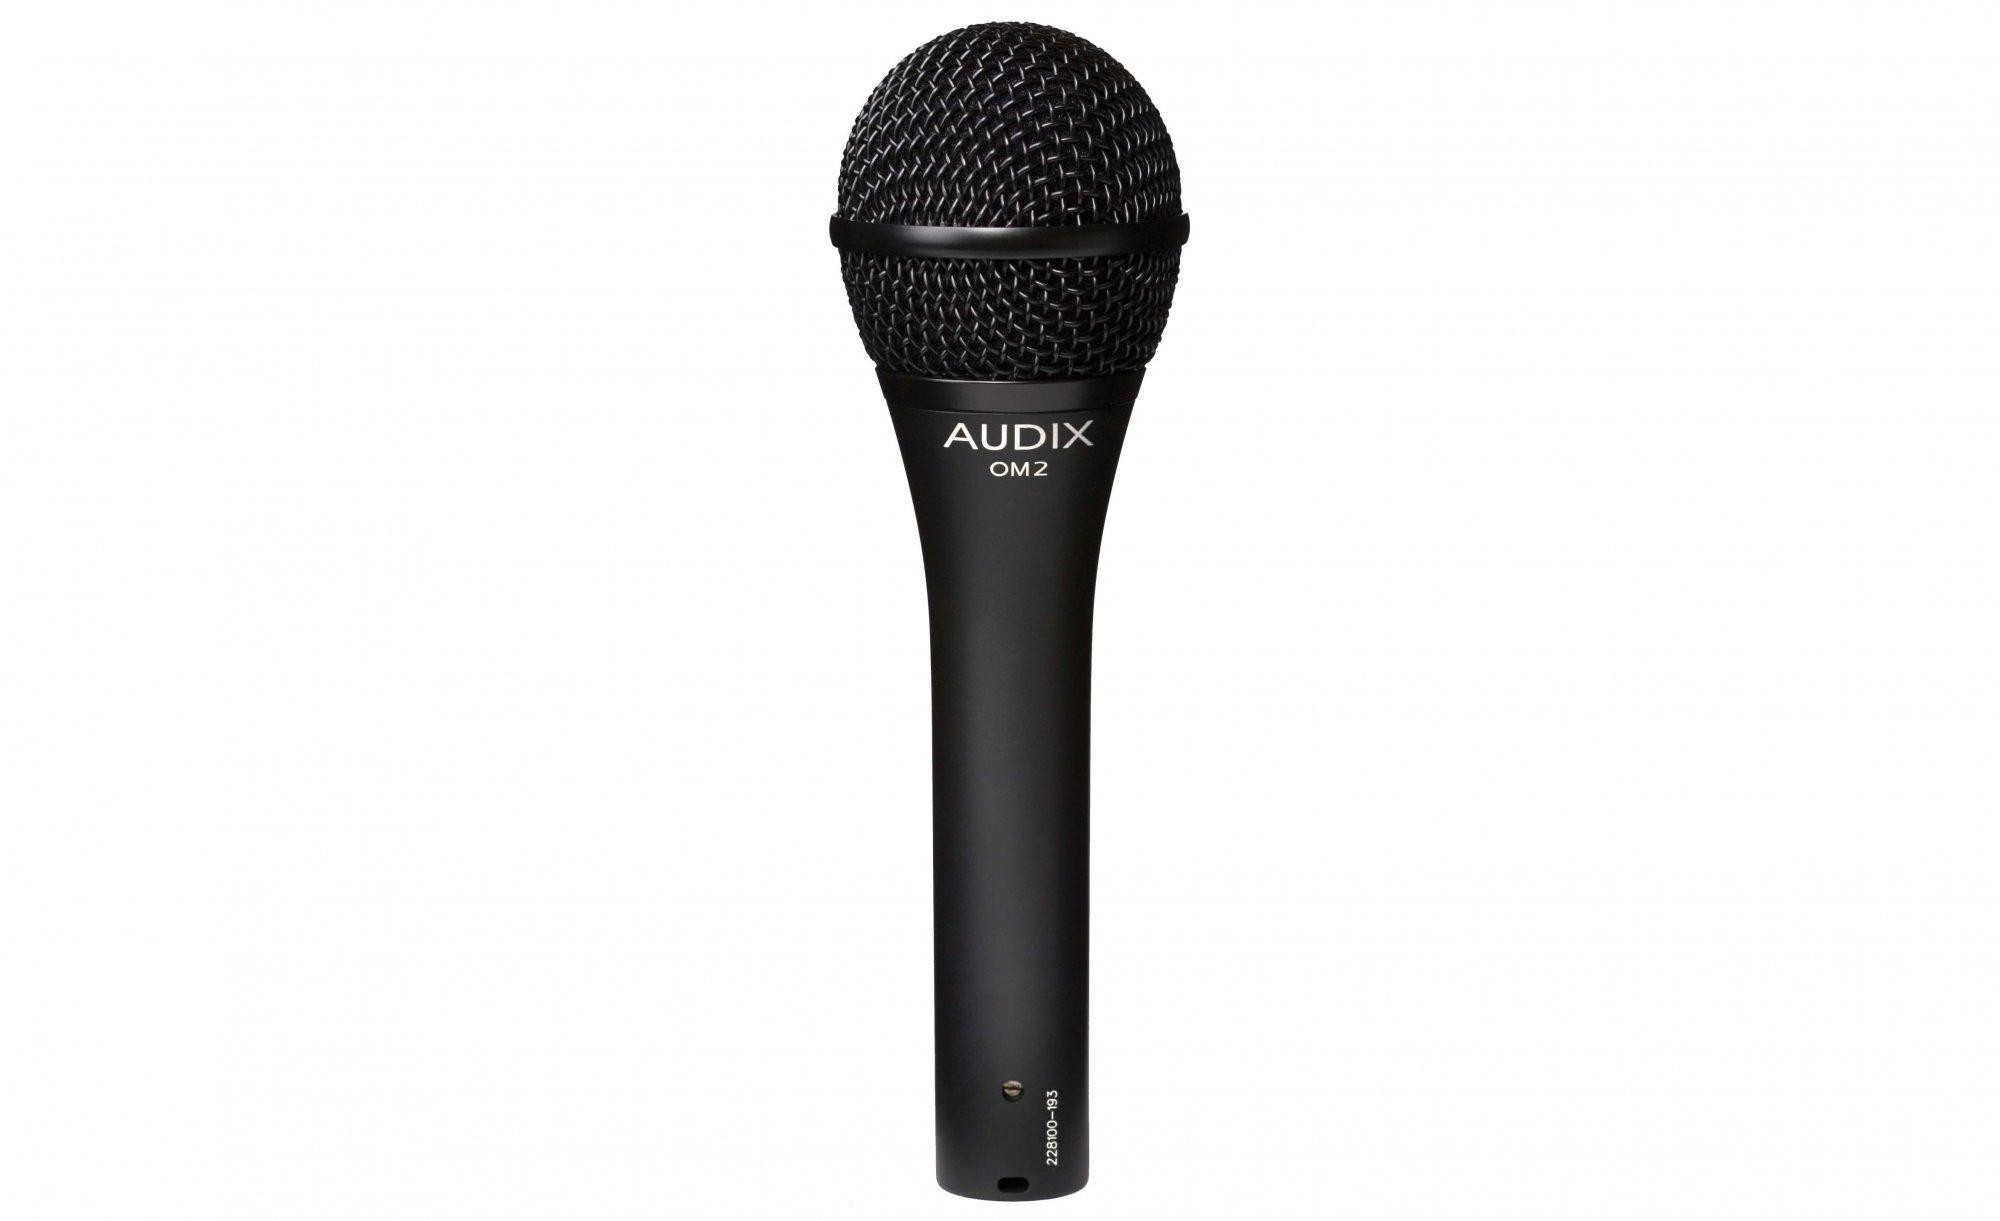 Audix OM2 Microphone